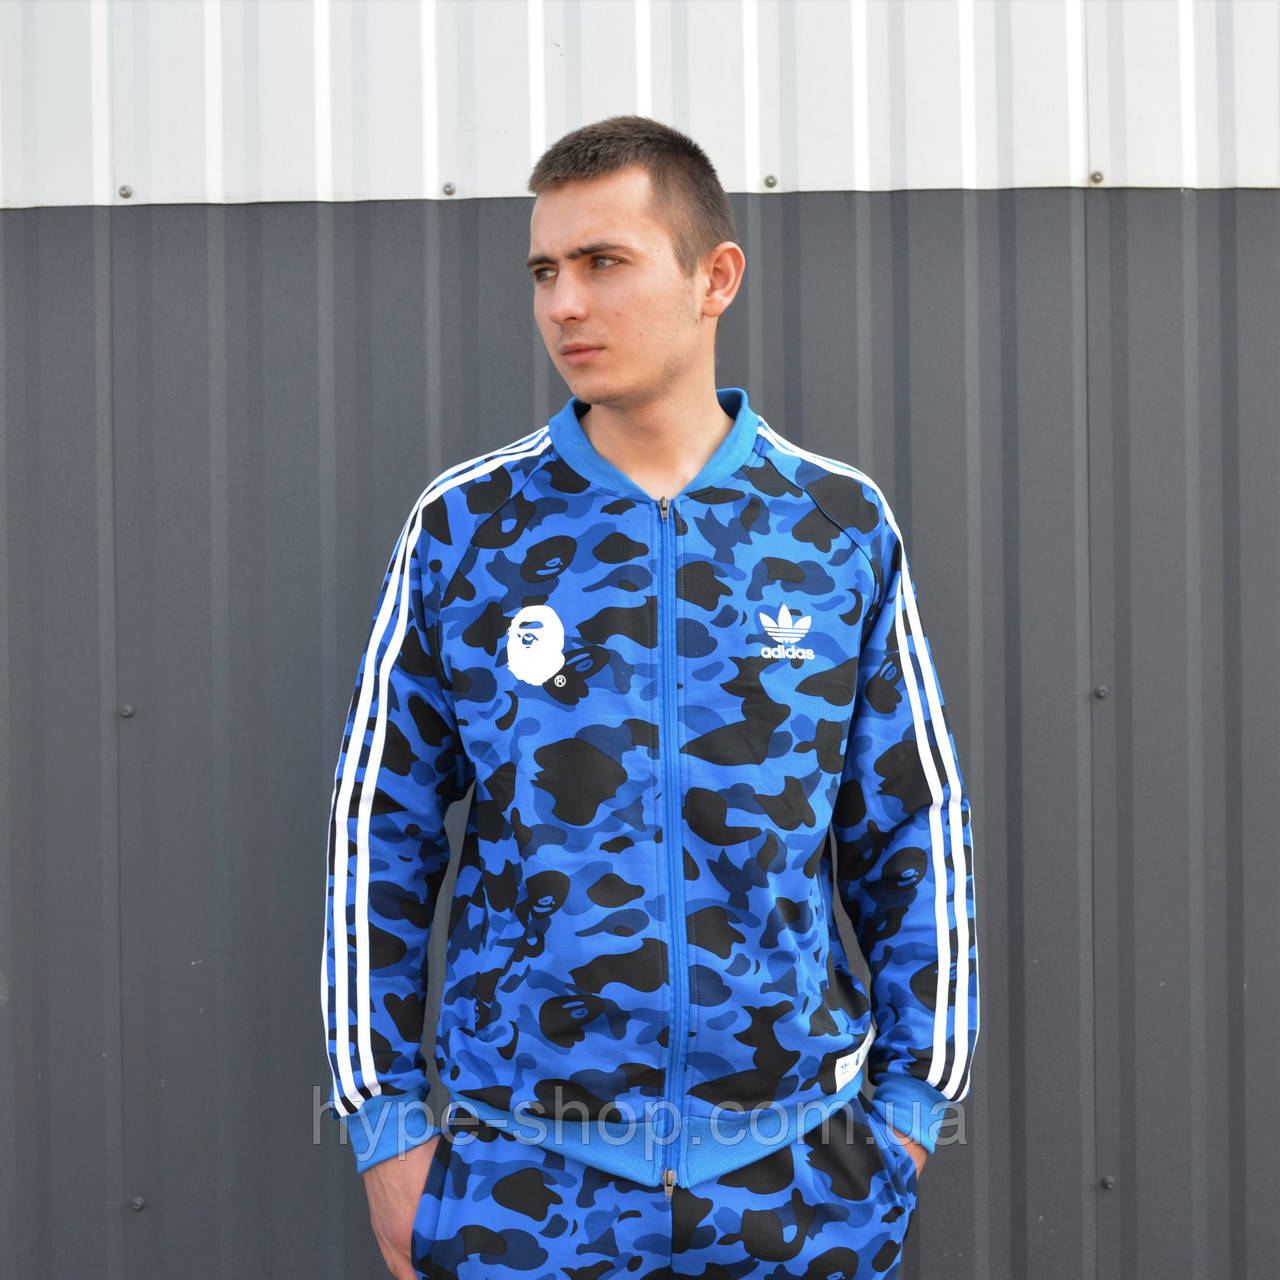 Мужская олимпийка в стиле Bape x Adidas Camo